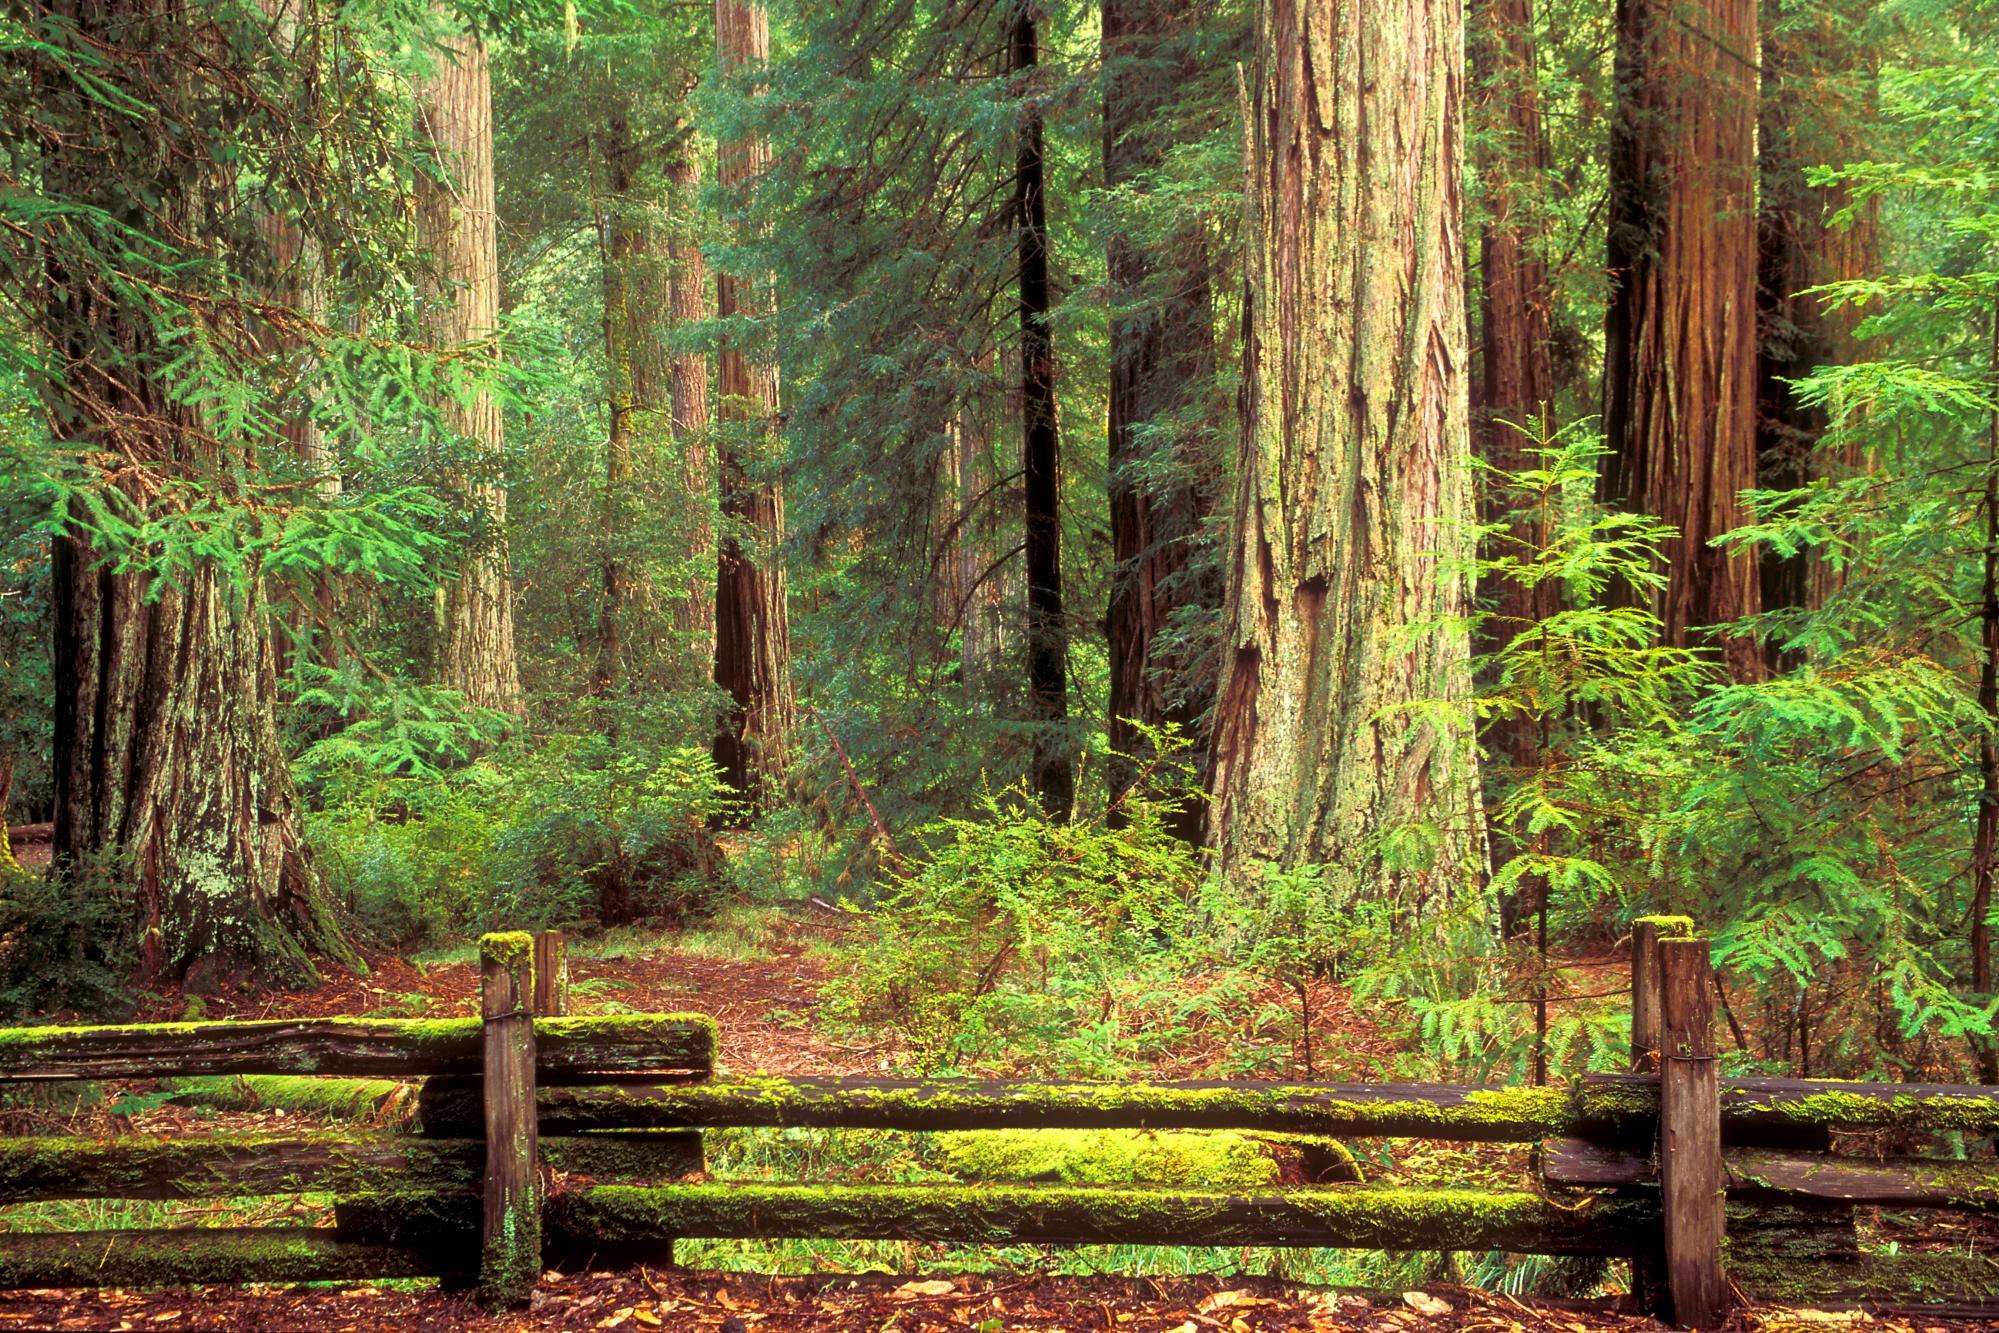 66 Redwood Forest Wallpaper On Wallpapersafari